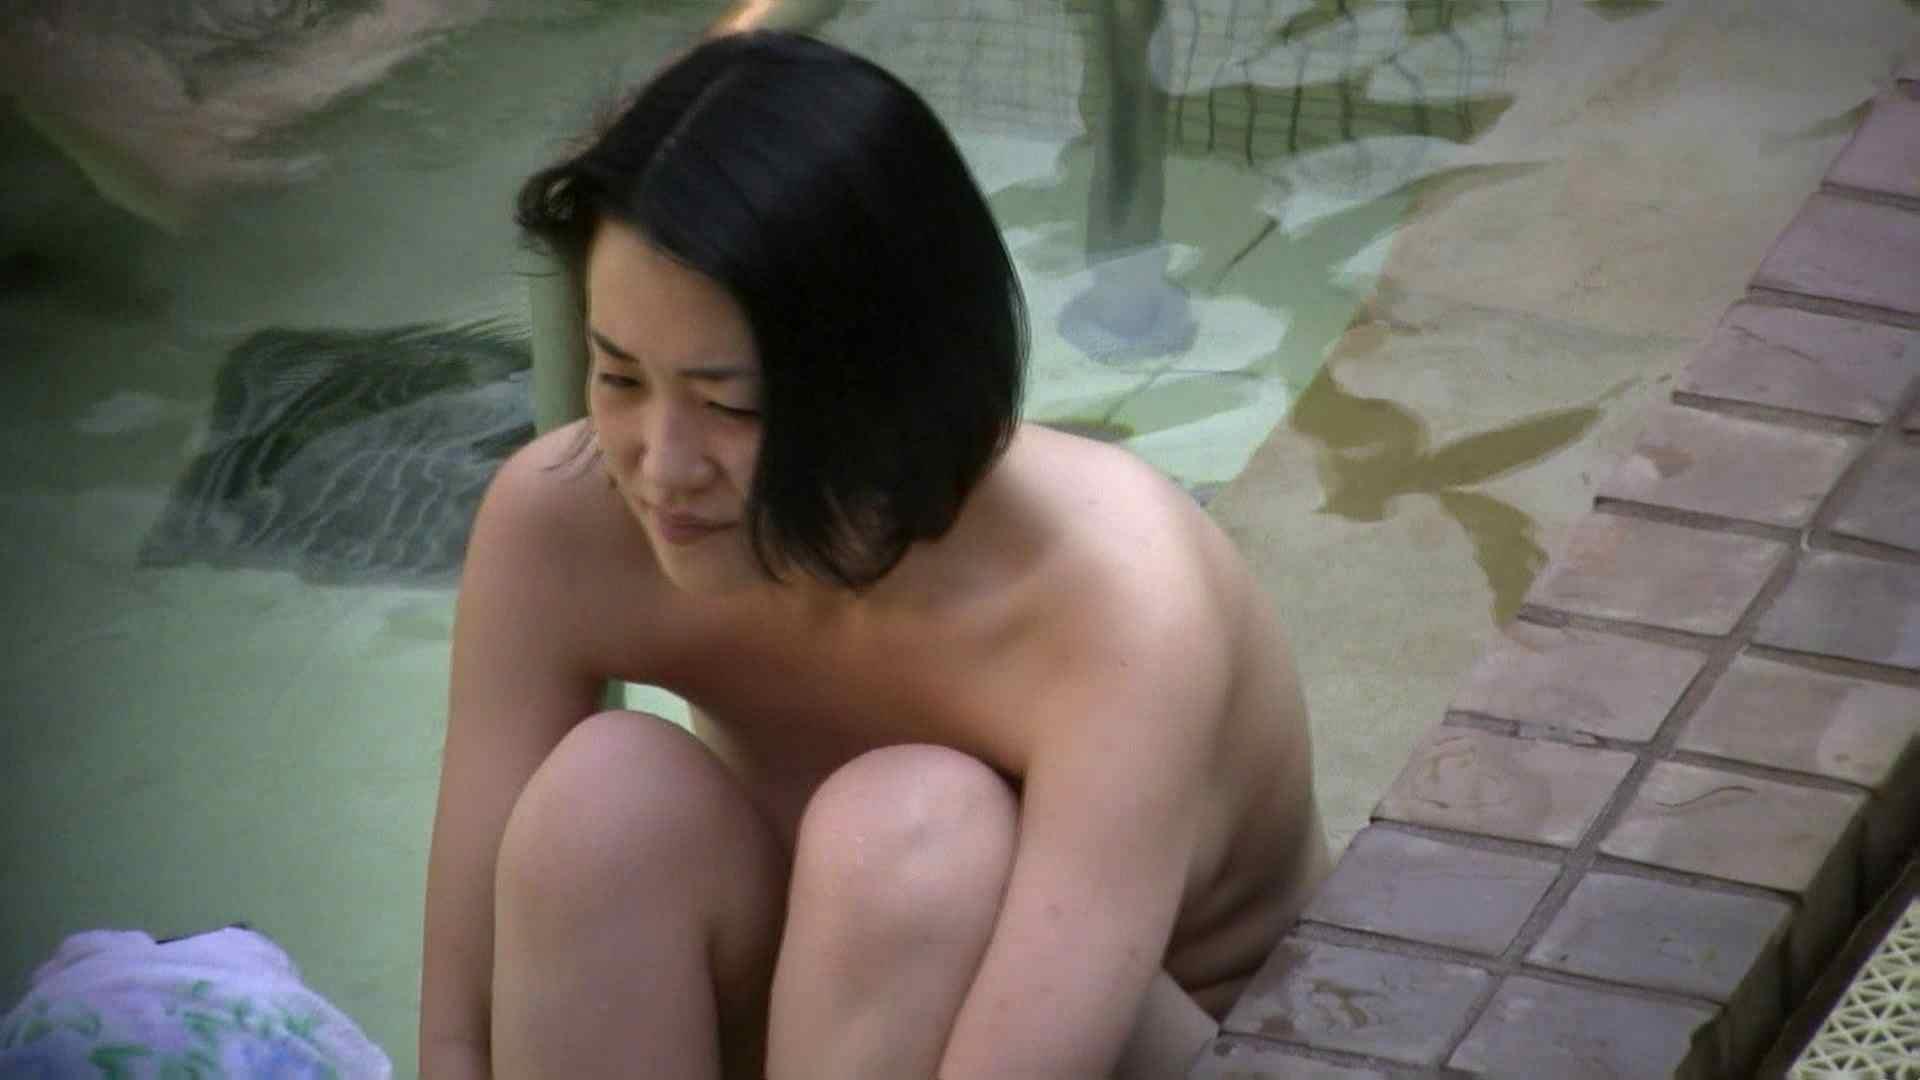 Aquaな露天風呂Vol.651 盗撮師作品 エロ無料画像 74pic 50